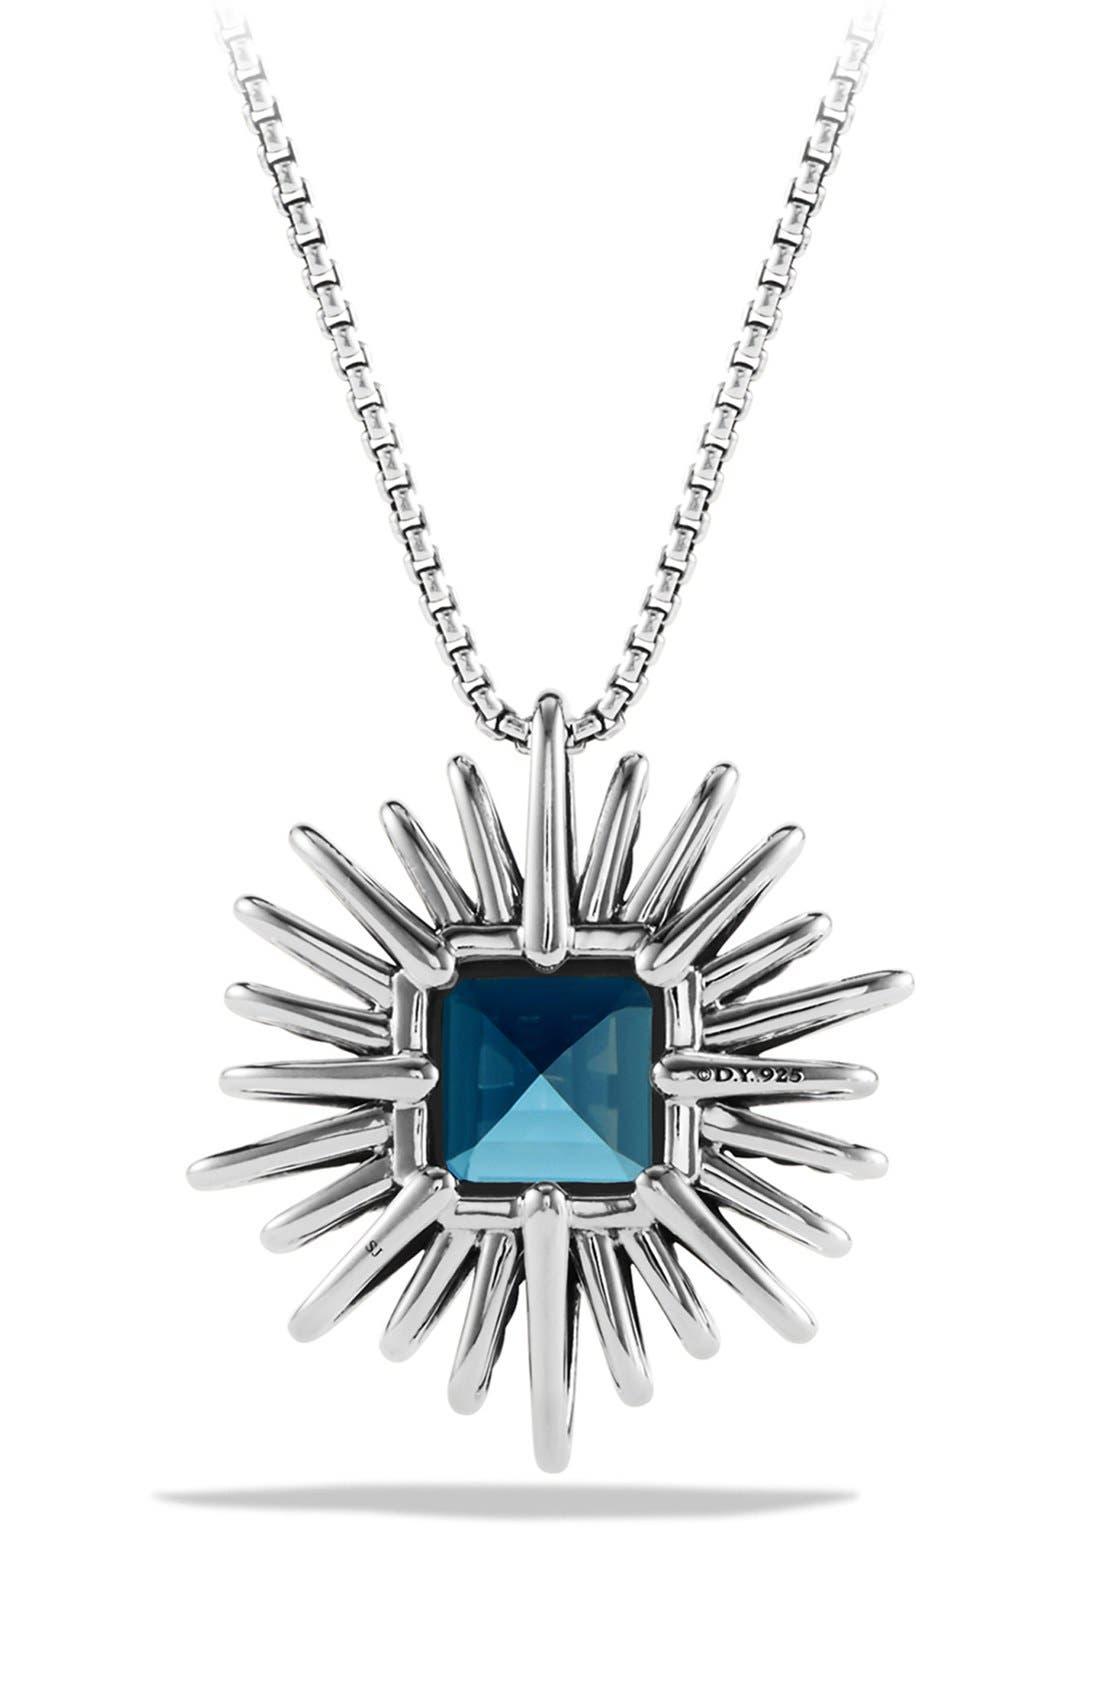 DAVID YURMAN,                             'Starburst' Necklace with Diamonds in Silver,                             Alternate thumbnail 3, color,                             HAMPTON BLUE TOPAZ